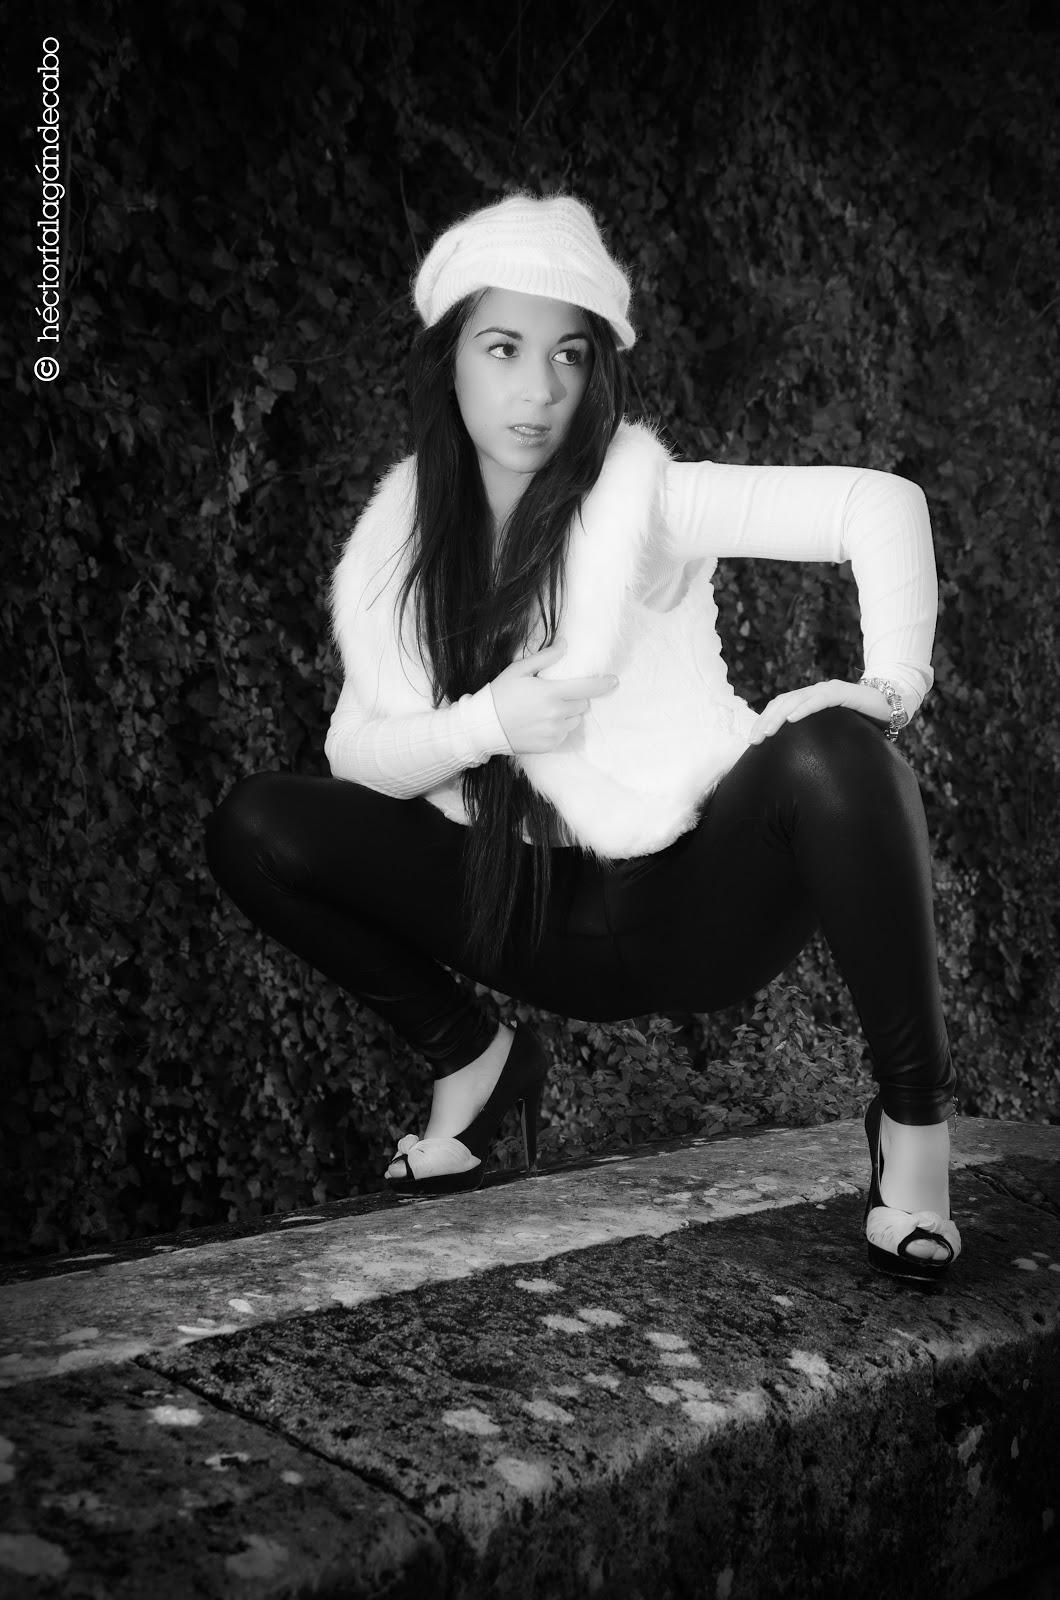 Fotografía Modelos Mallorca. Jessica Ruiz Lado: Desafiando el Invierno. Héctor Falagán De Cabo | hfilms & photography. Mallorca, Islas Baleares, España.